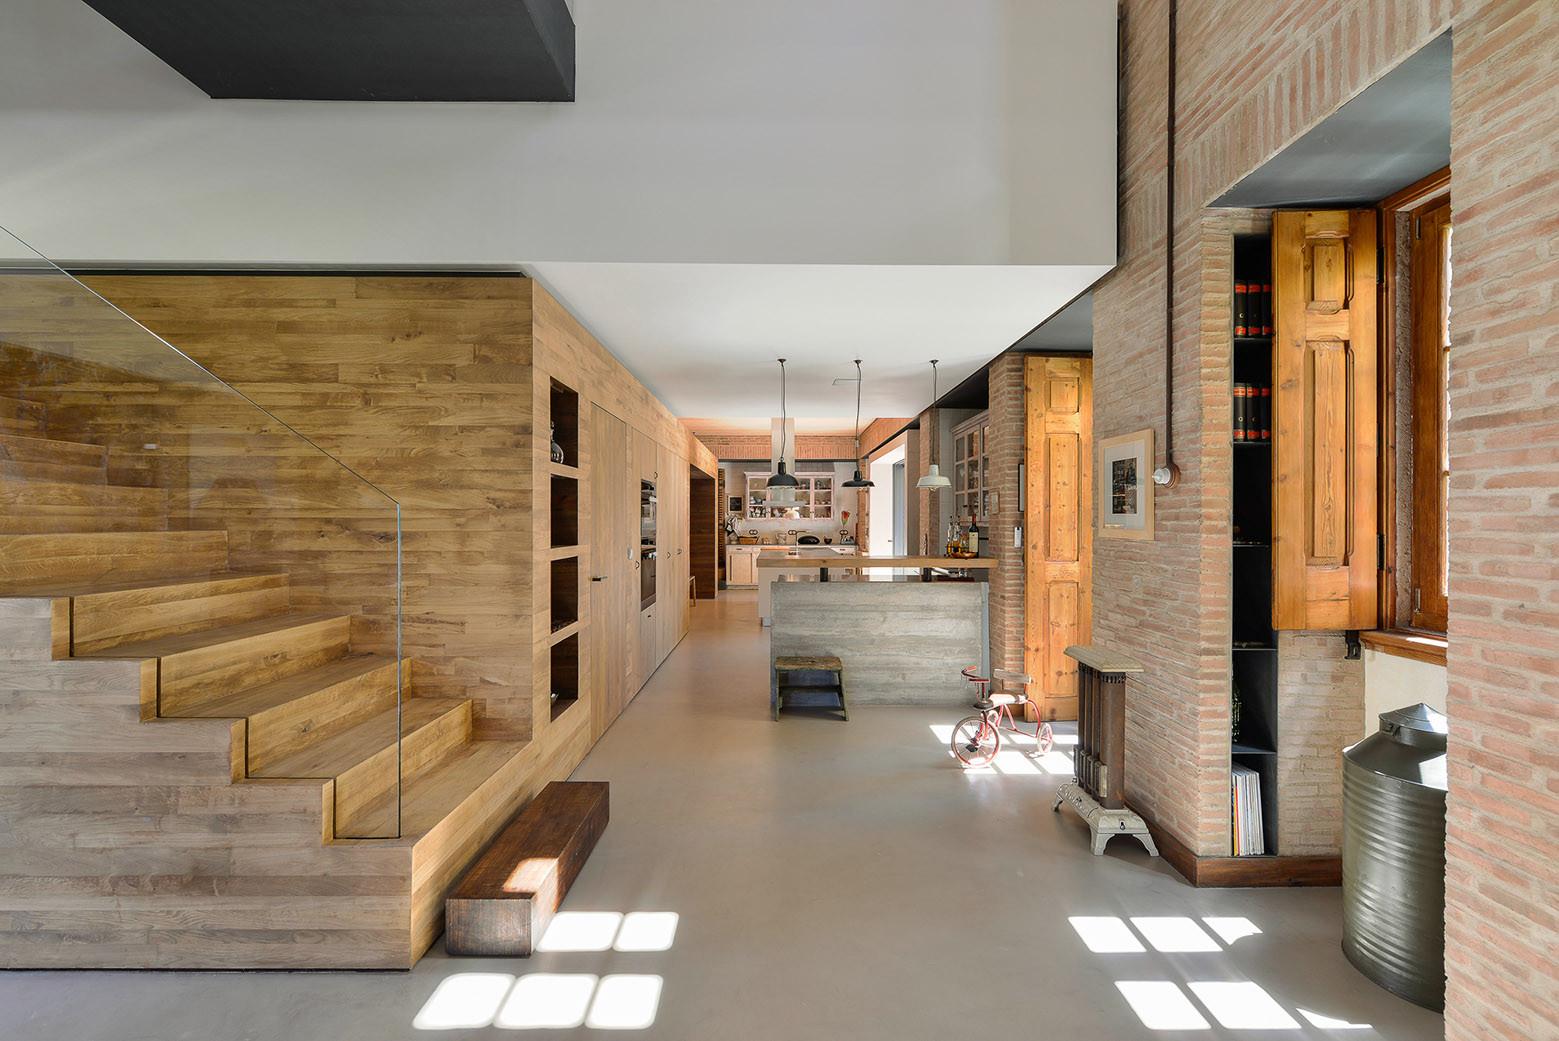 House in Estoril, Ricardo Moreno Arquitectos (vue rez-de-chaussée)